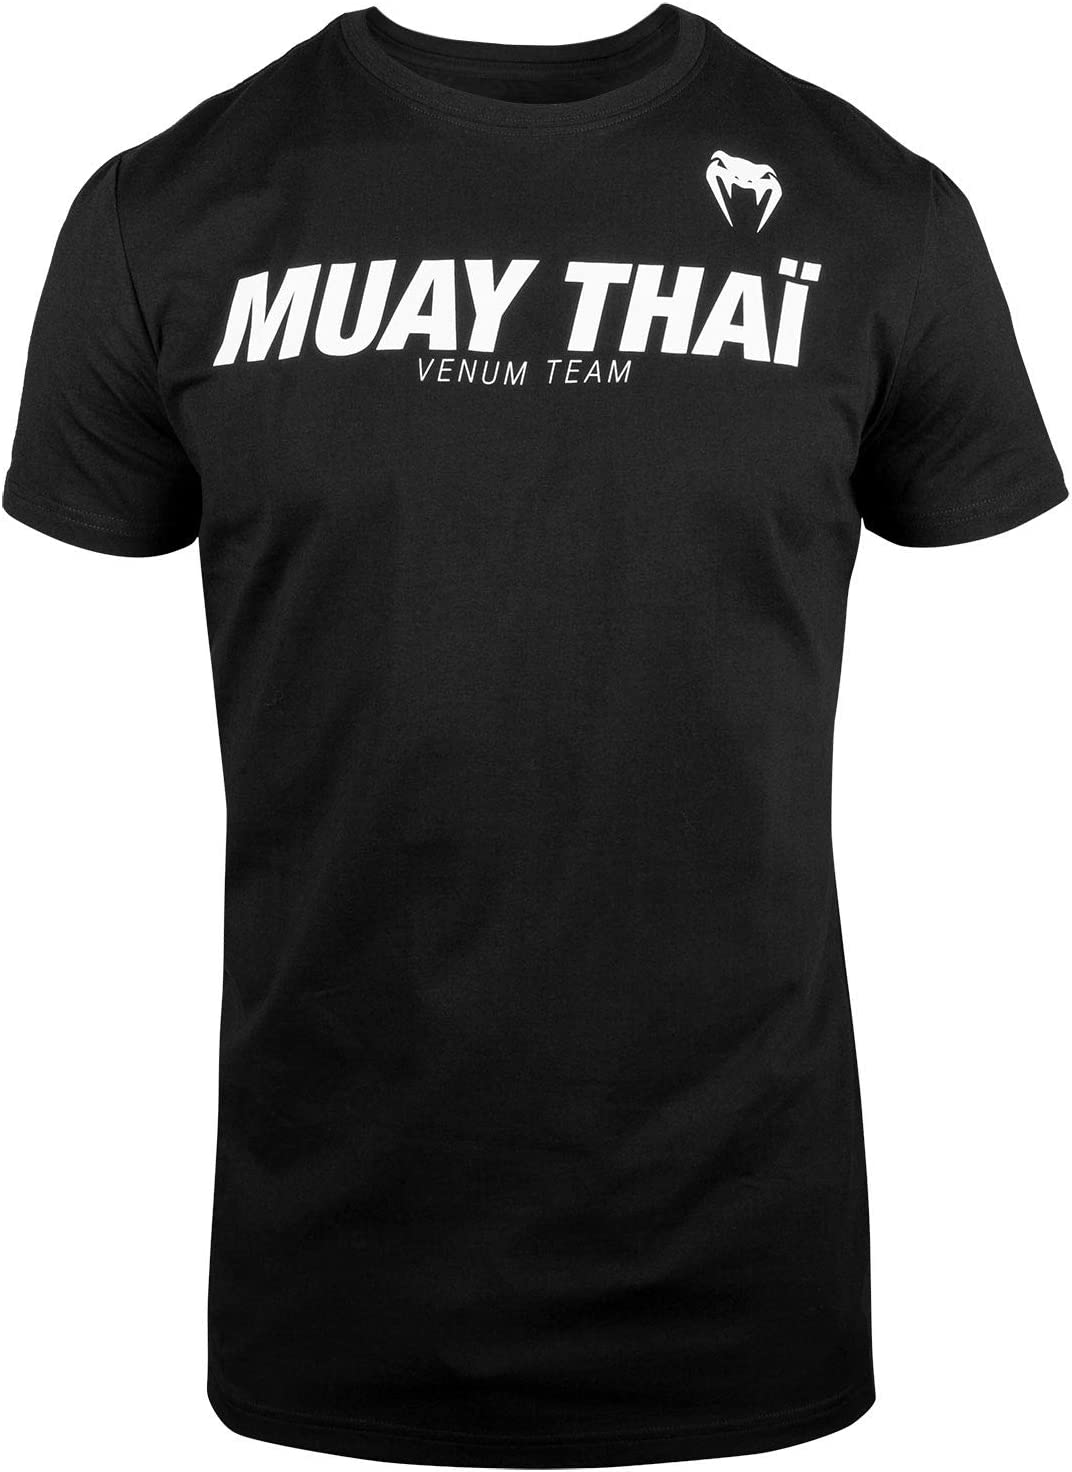 Venum Herren Muay Thai Vt T-Shirt